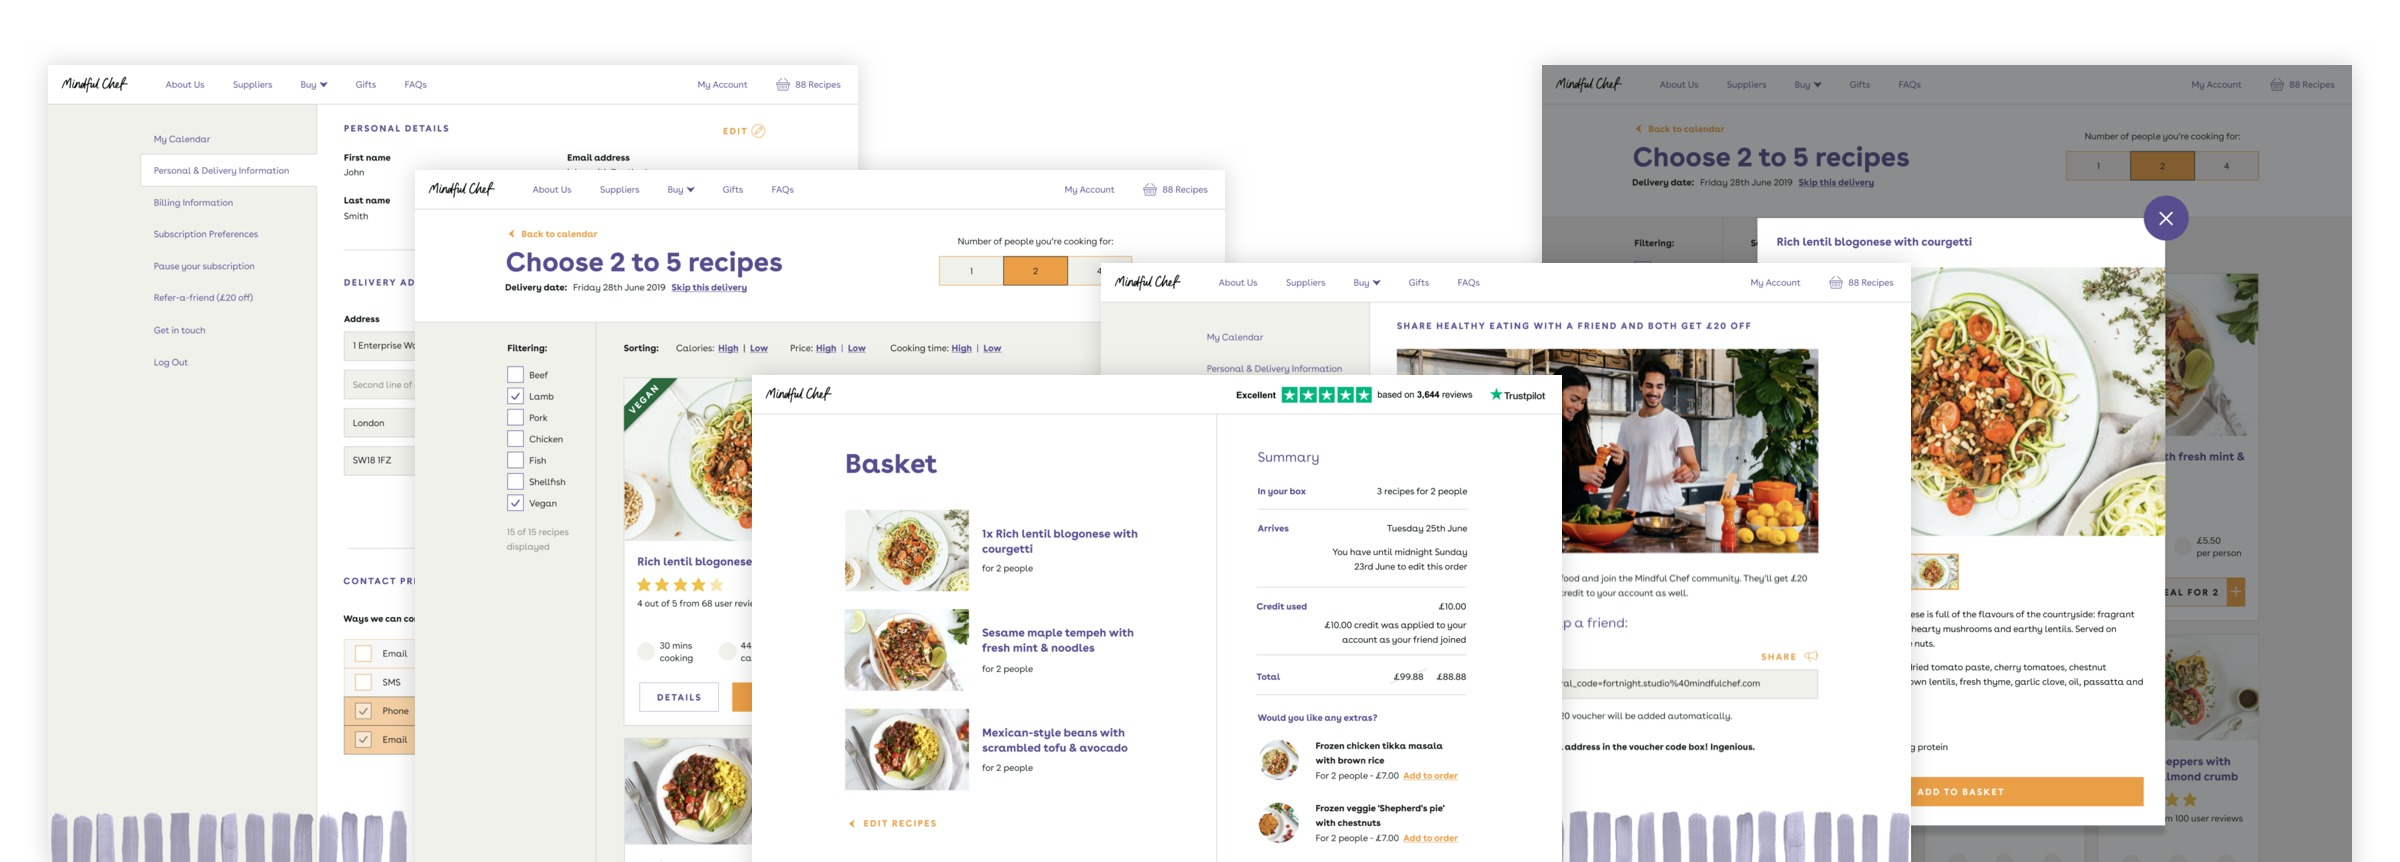 Mindful Chef - Web Designs